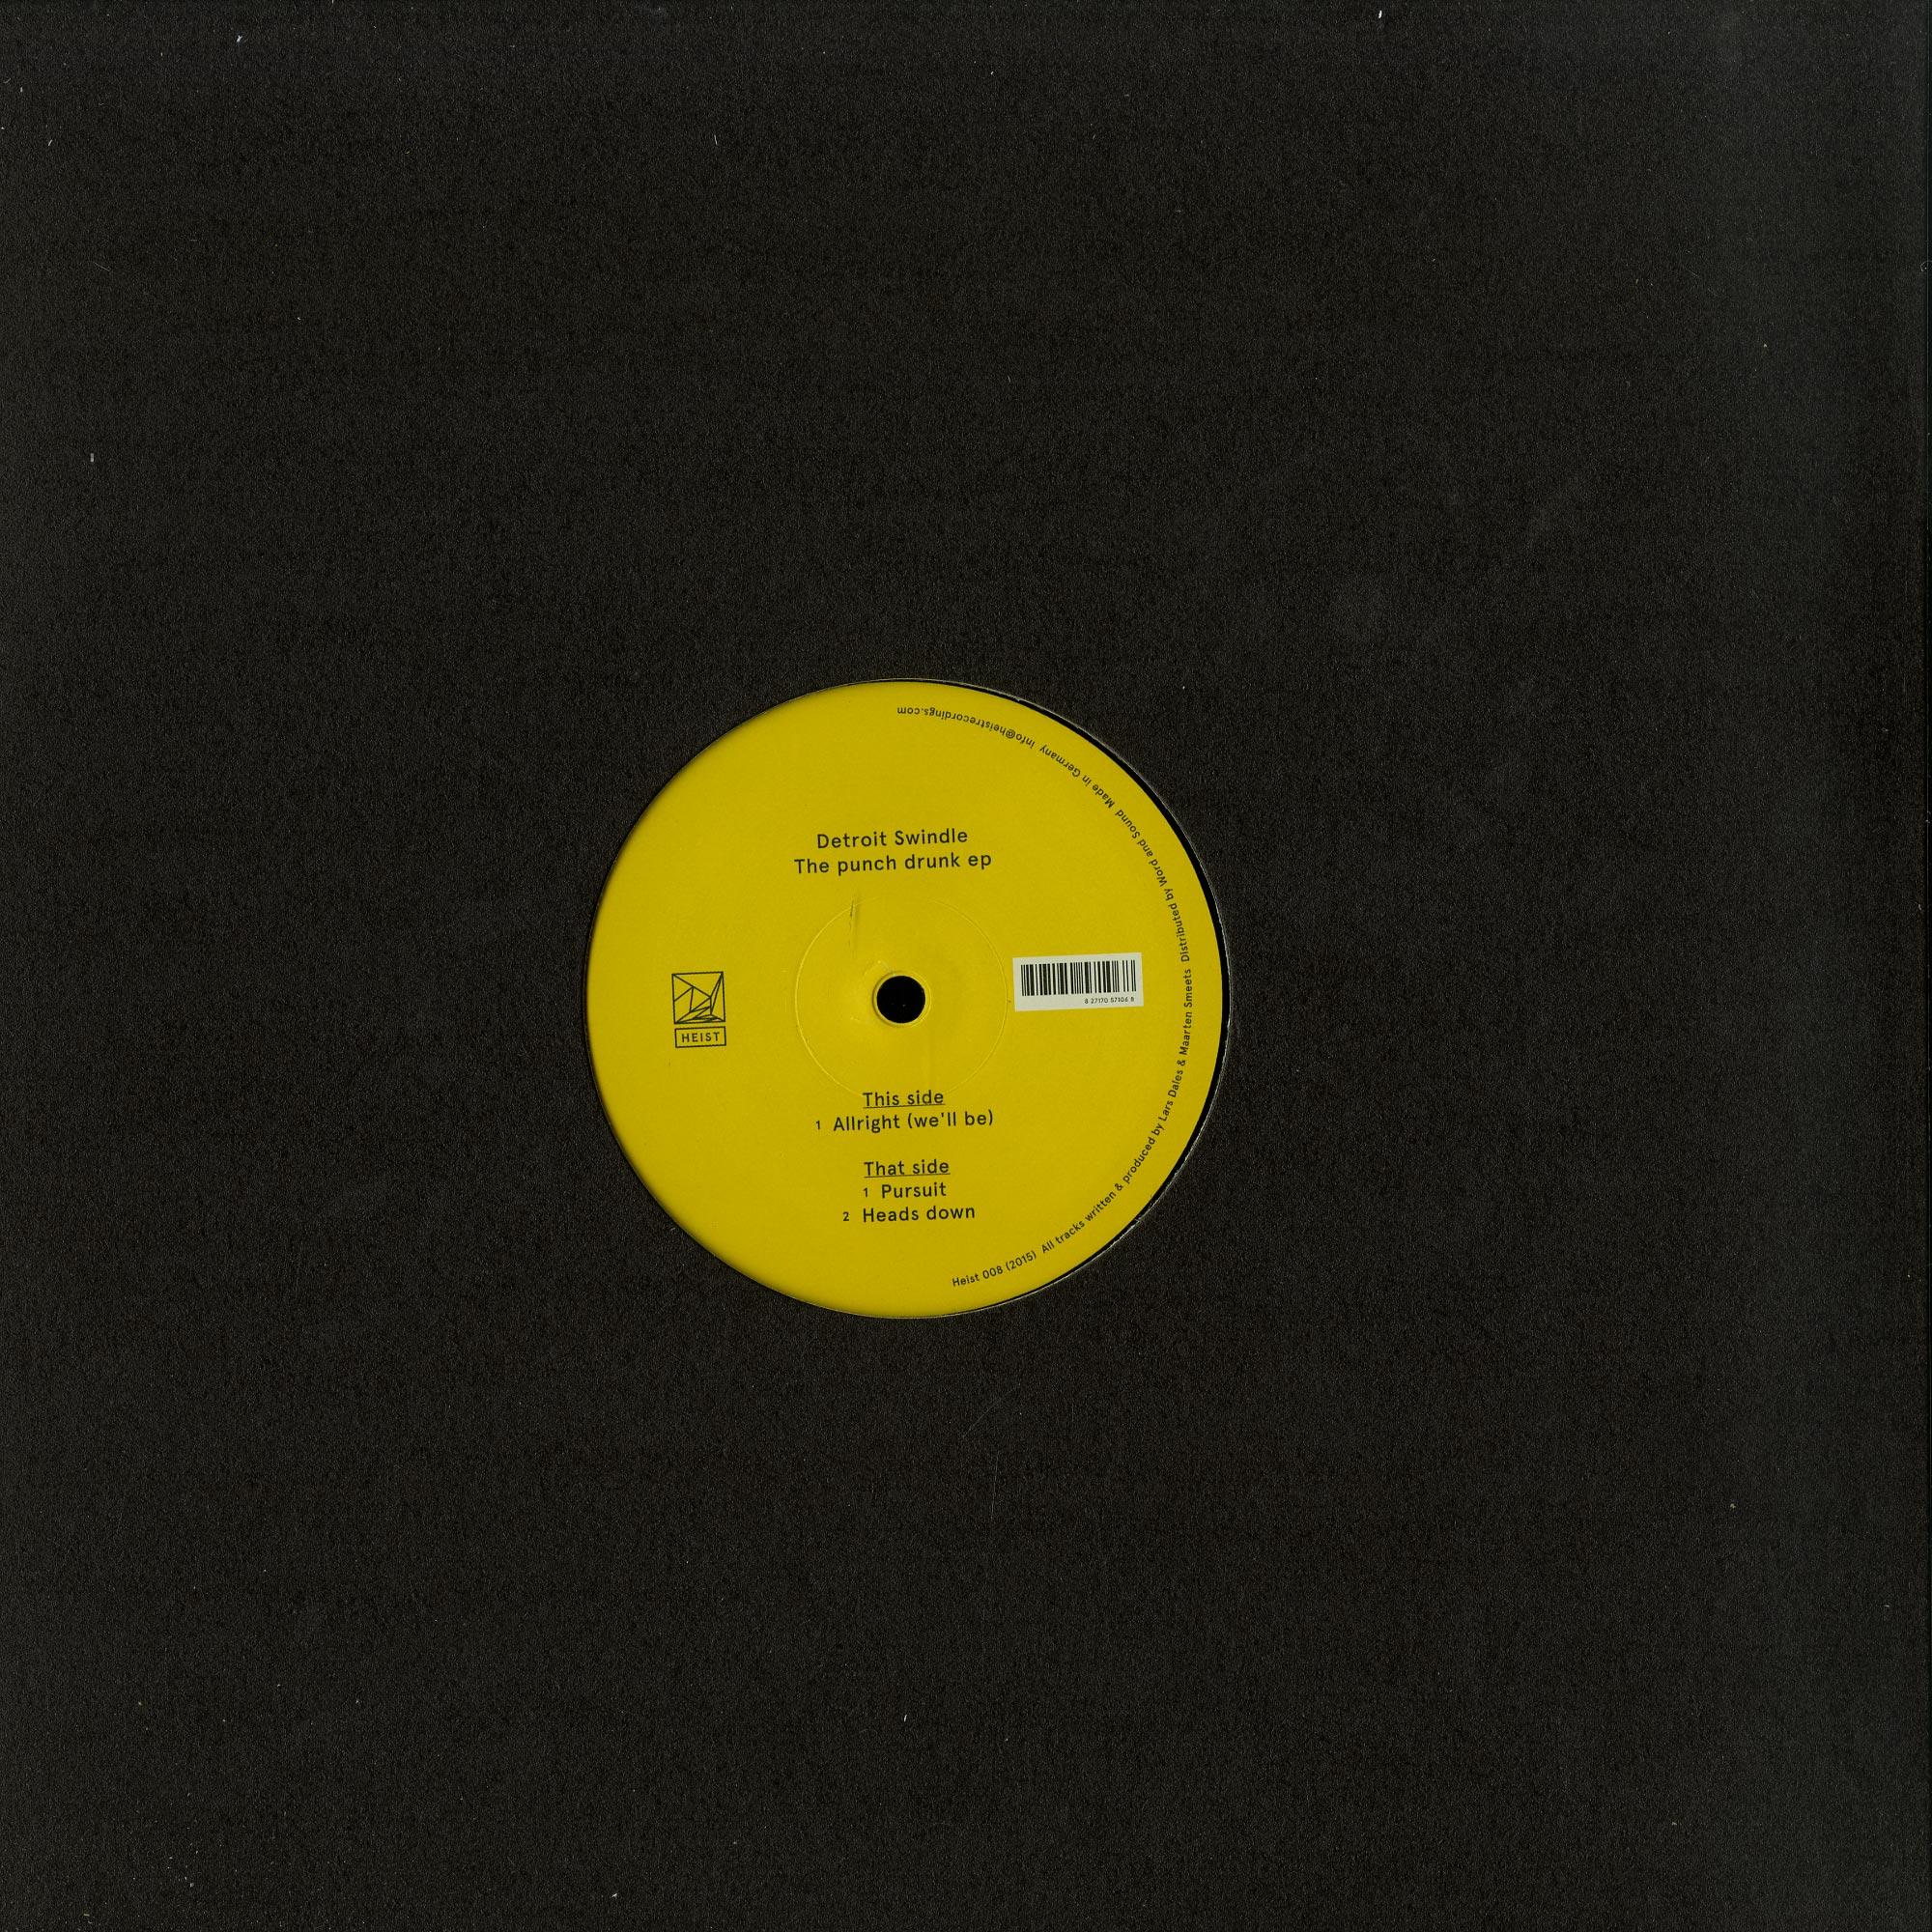 Detroit Swindle - THE PUNCH DRUNK EP